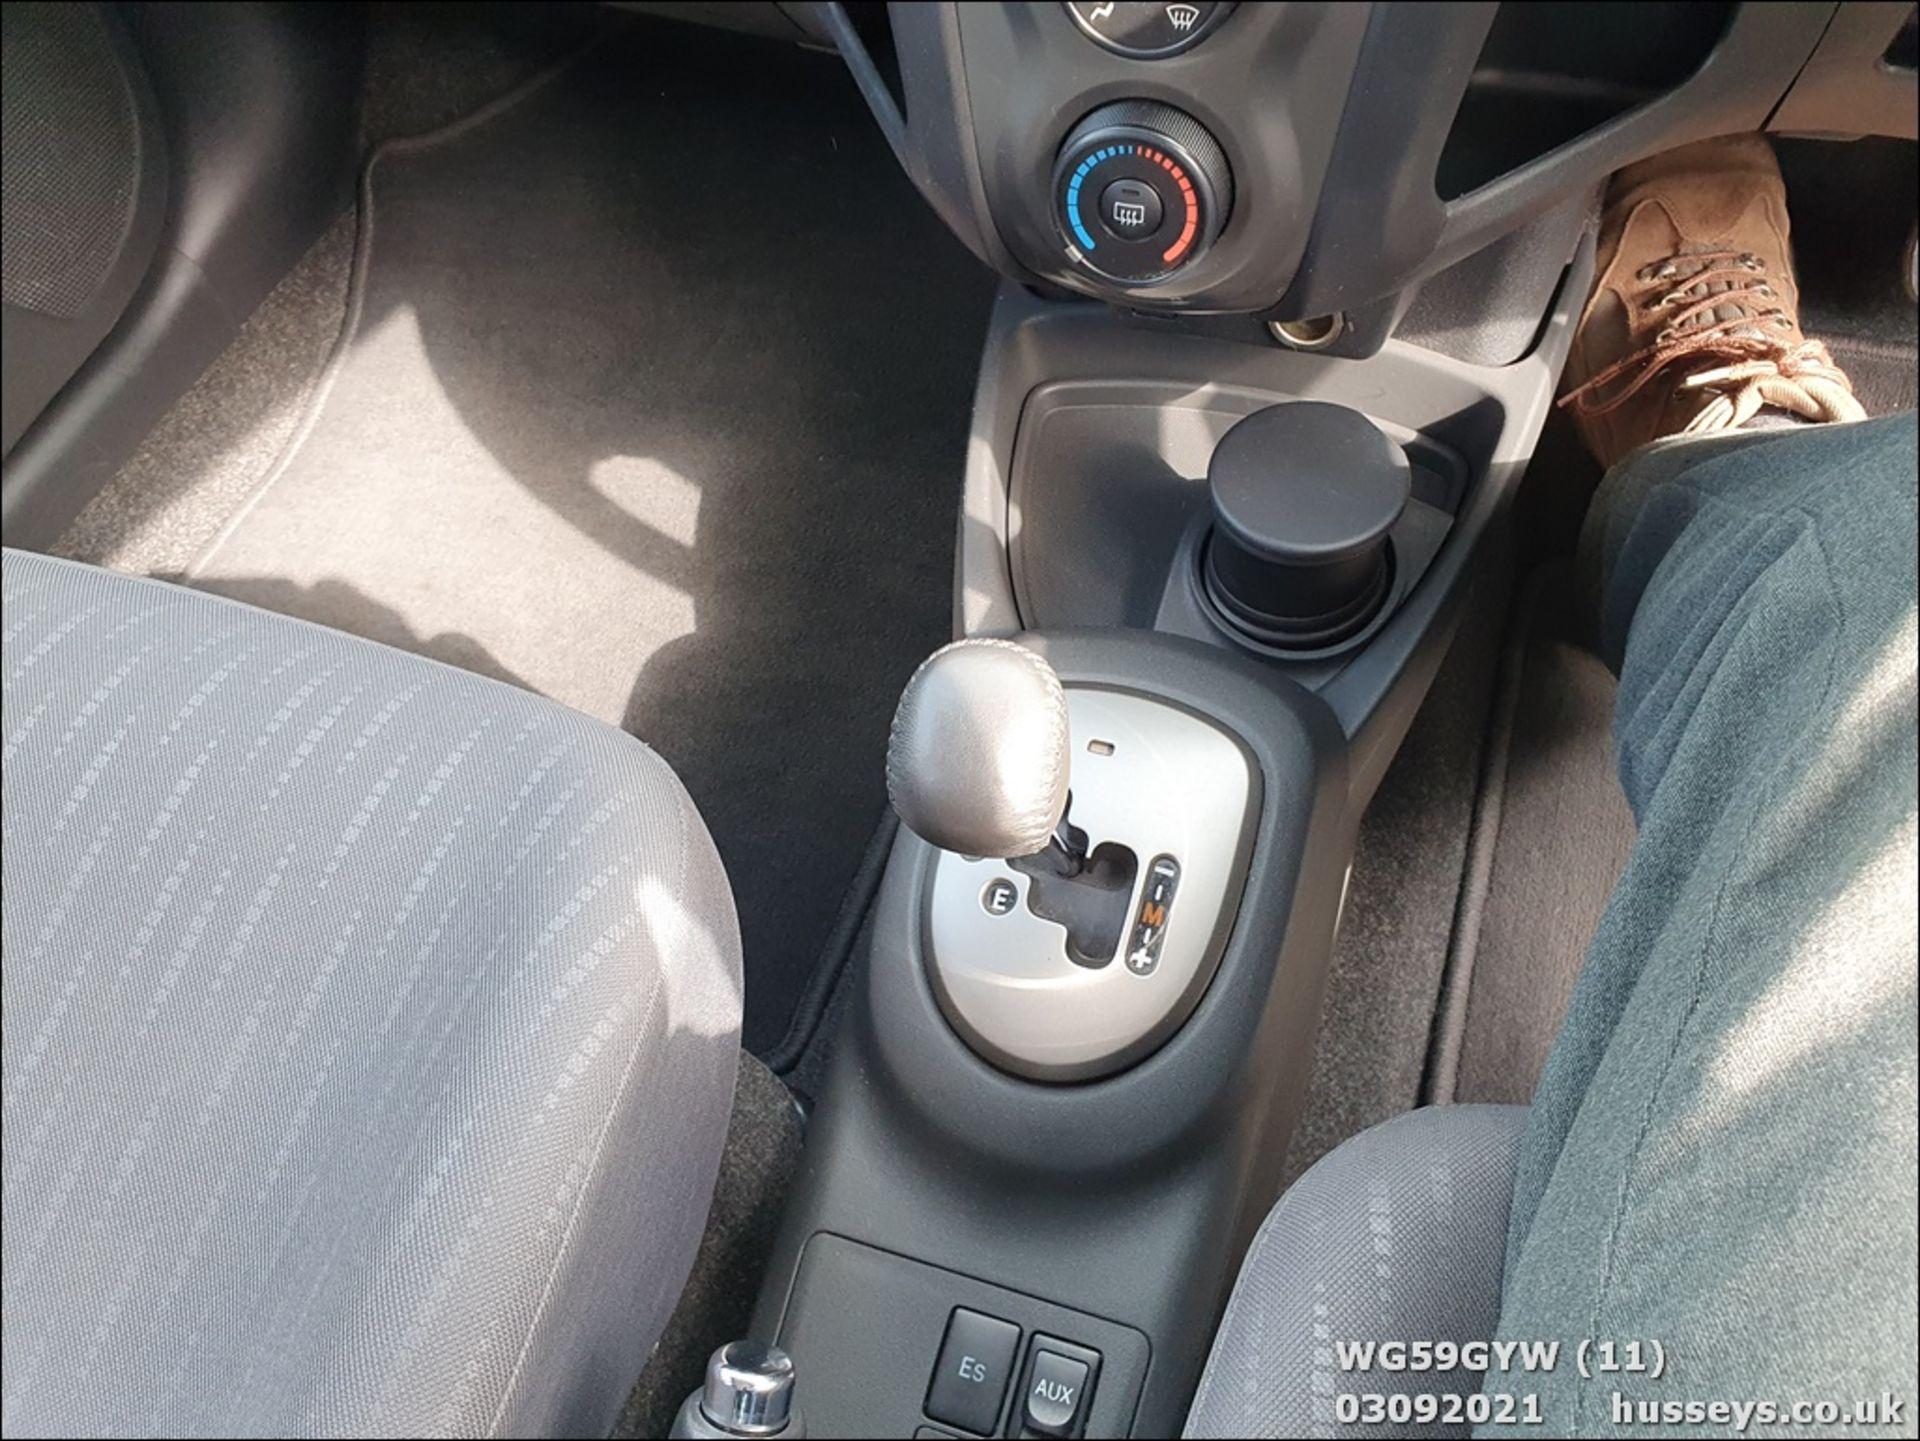 09/59 TOYOTA YARIS TR VVT-I S-A - 1329cc 5dr Hatchback (Silver, 87k) - Image 11 of 12